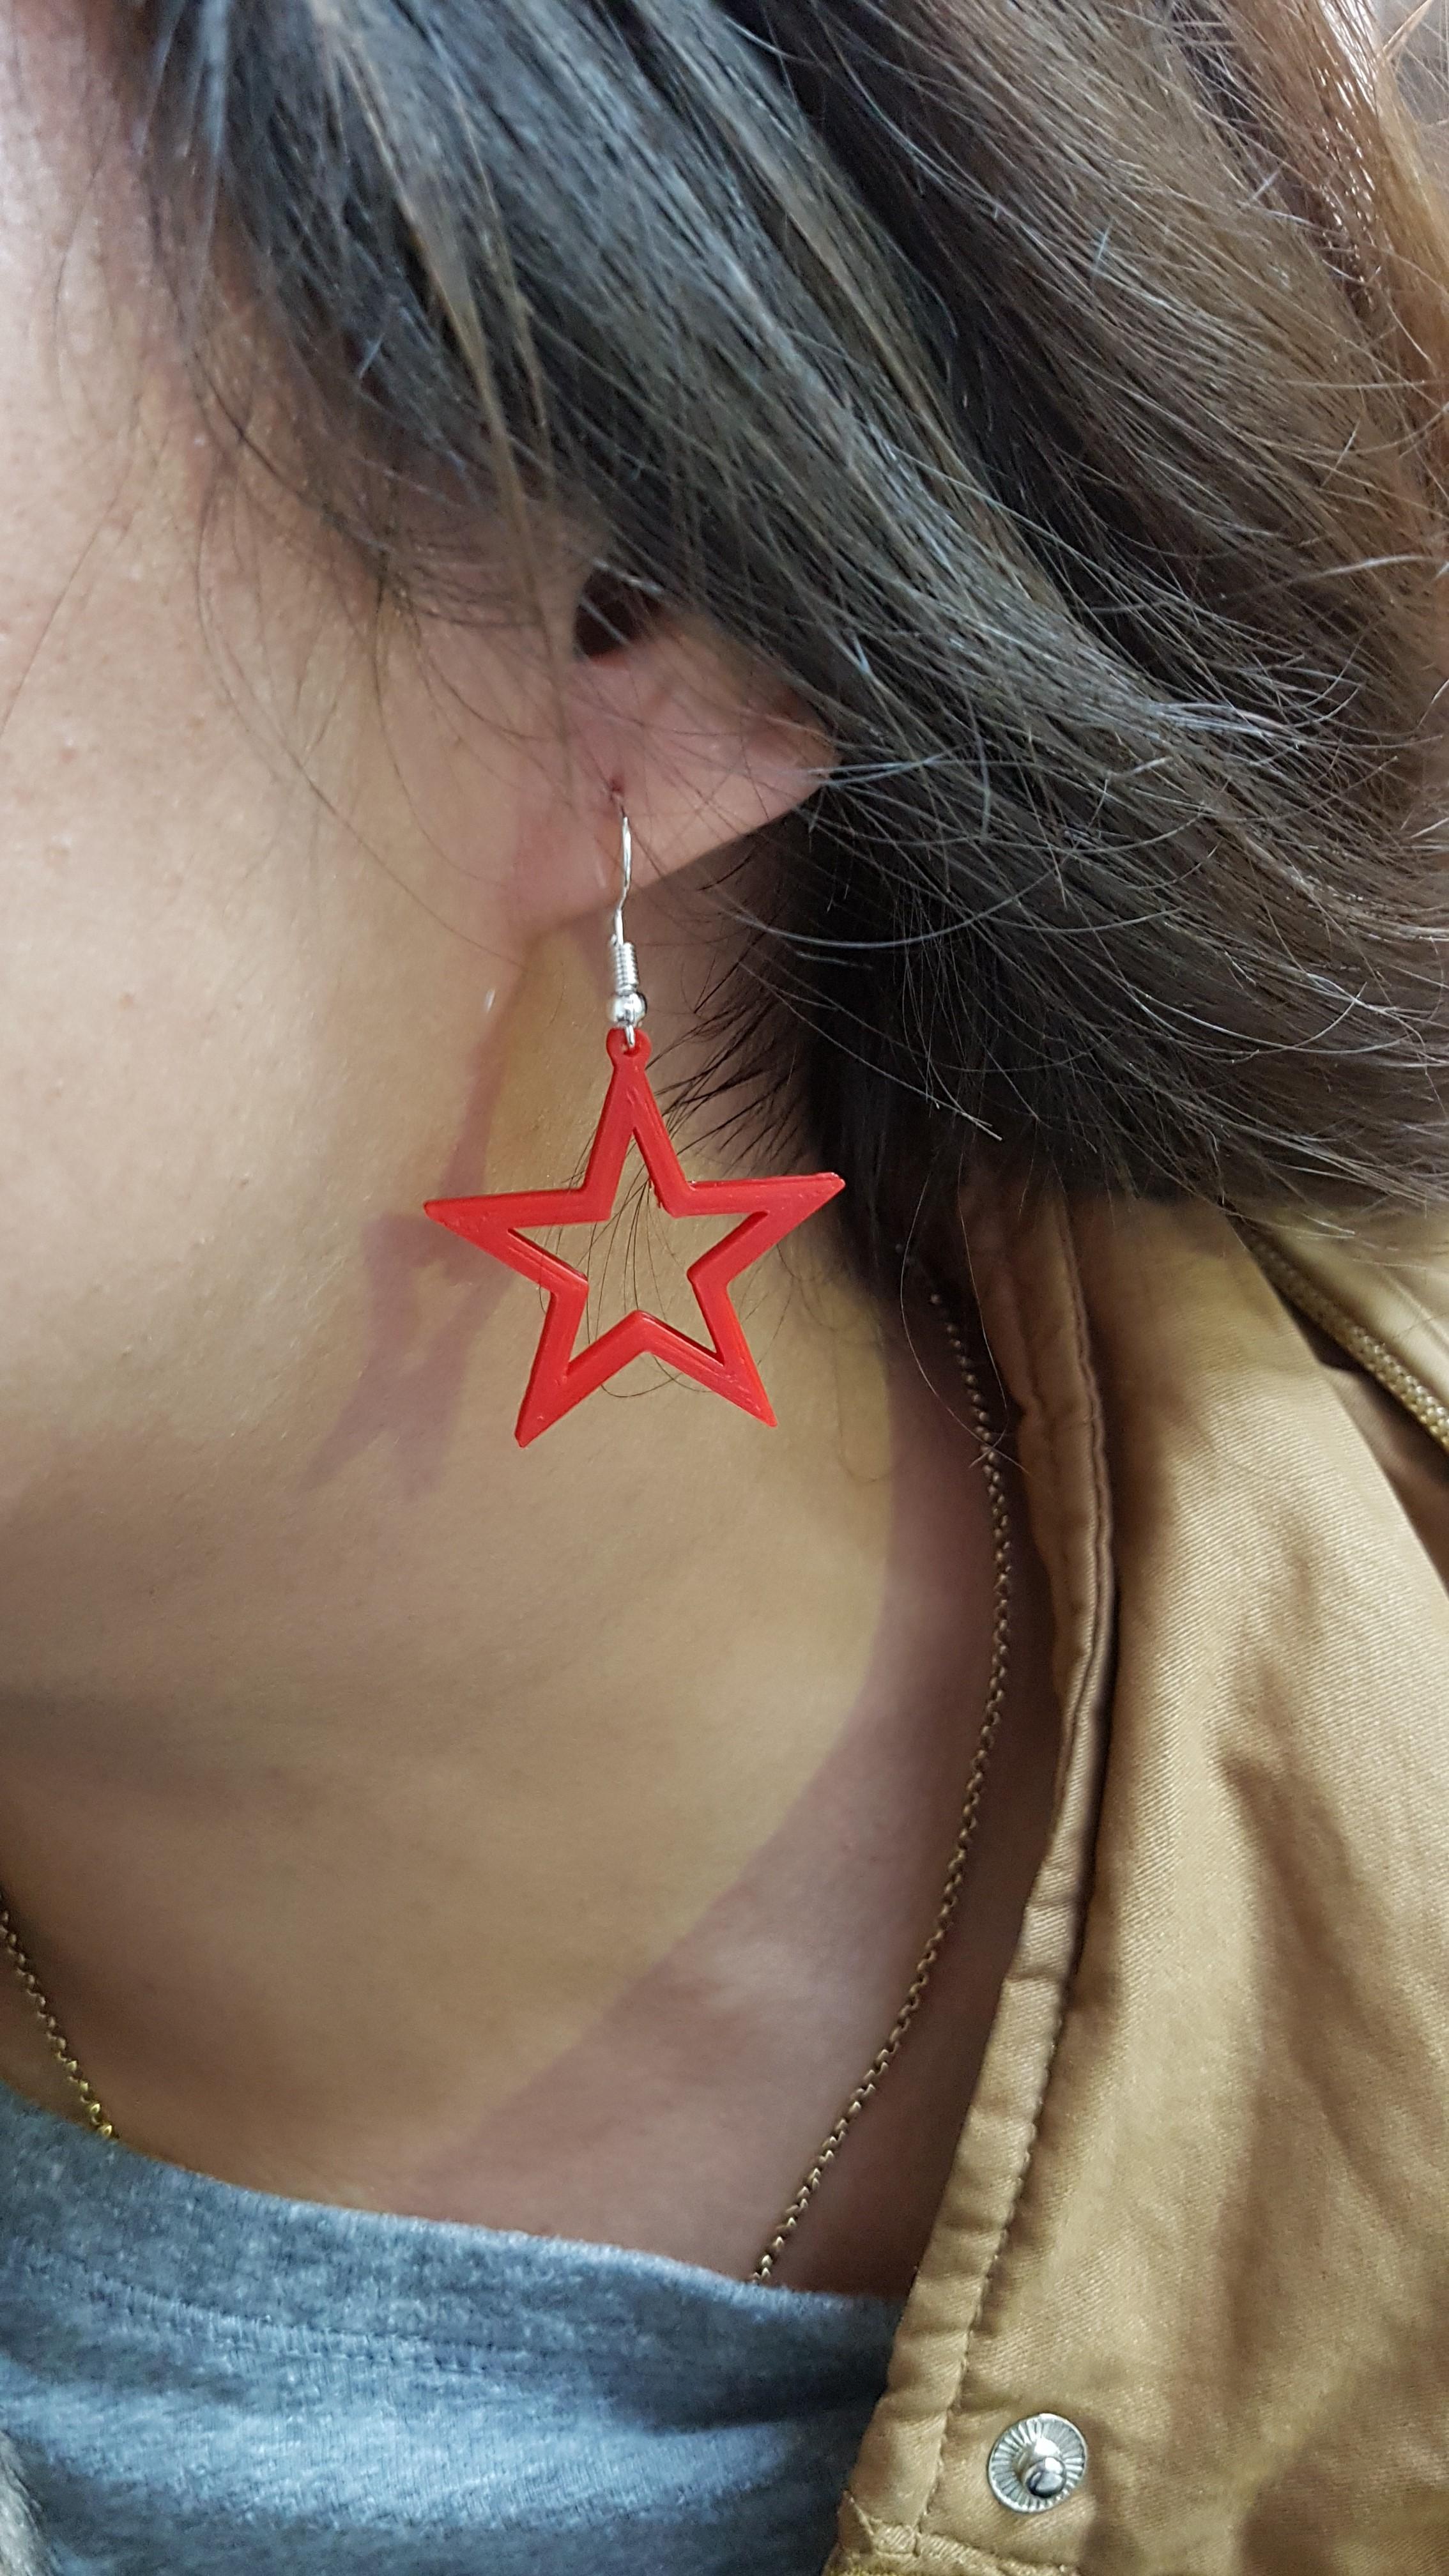 20191021_180840.jpg Download STL file Fantasy Earrings 1 • 3D printer design, conagrr